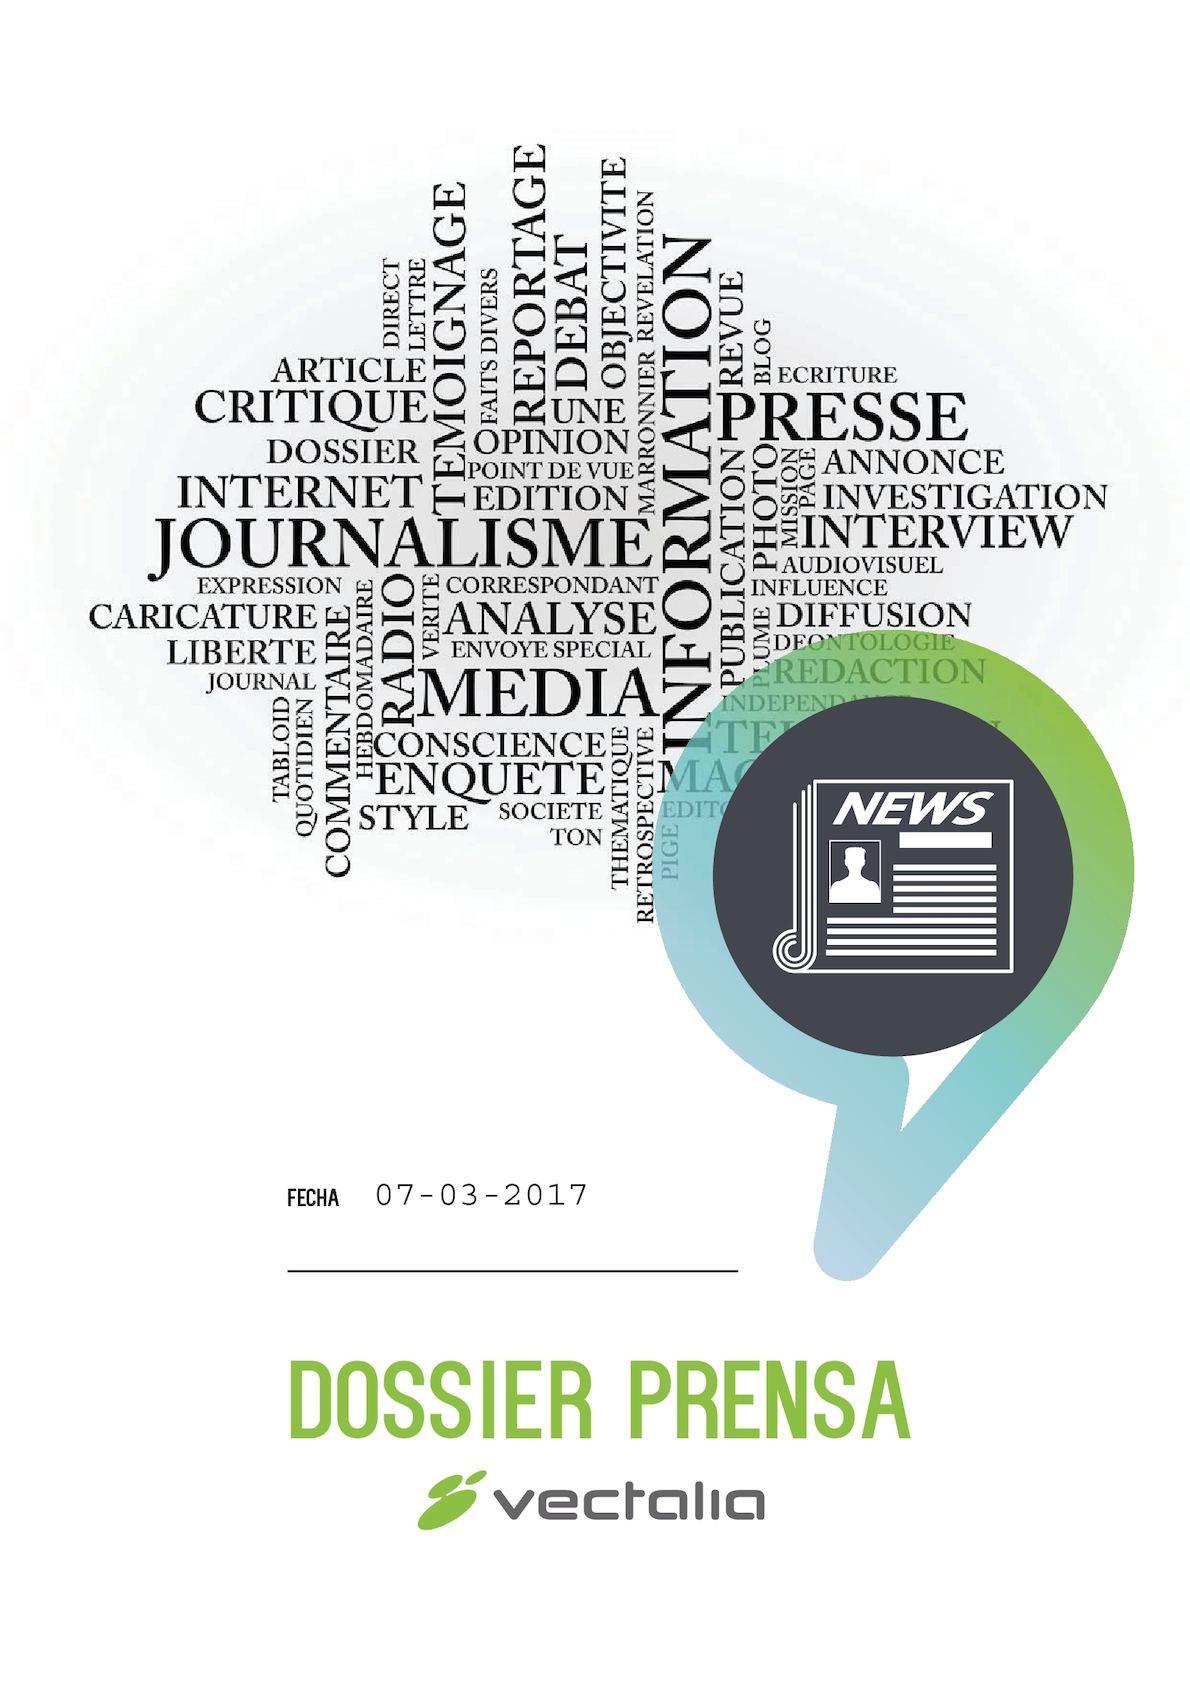 Calendario Escolar 2019 Costa Rica Más Recientes Calaméo Dossier Prensa Martes 7 De Marzo De 2017